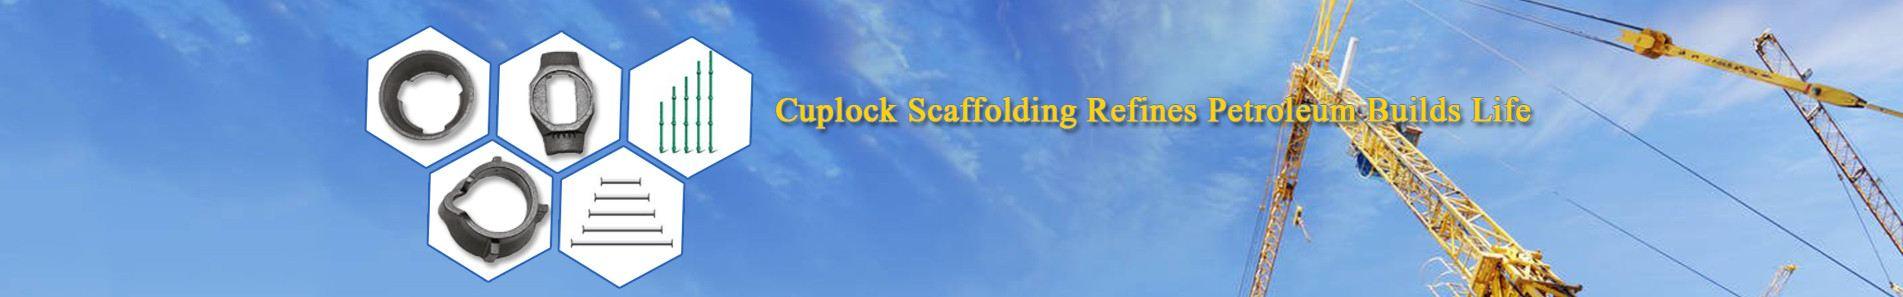 cuplock-scaffolding